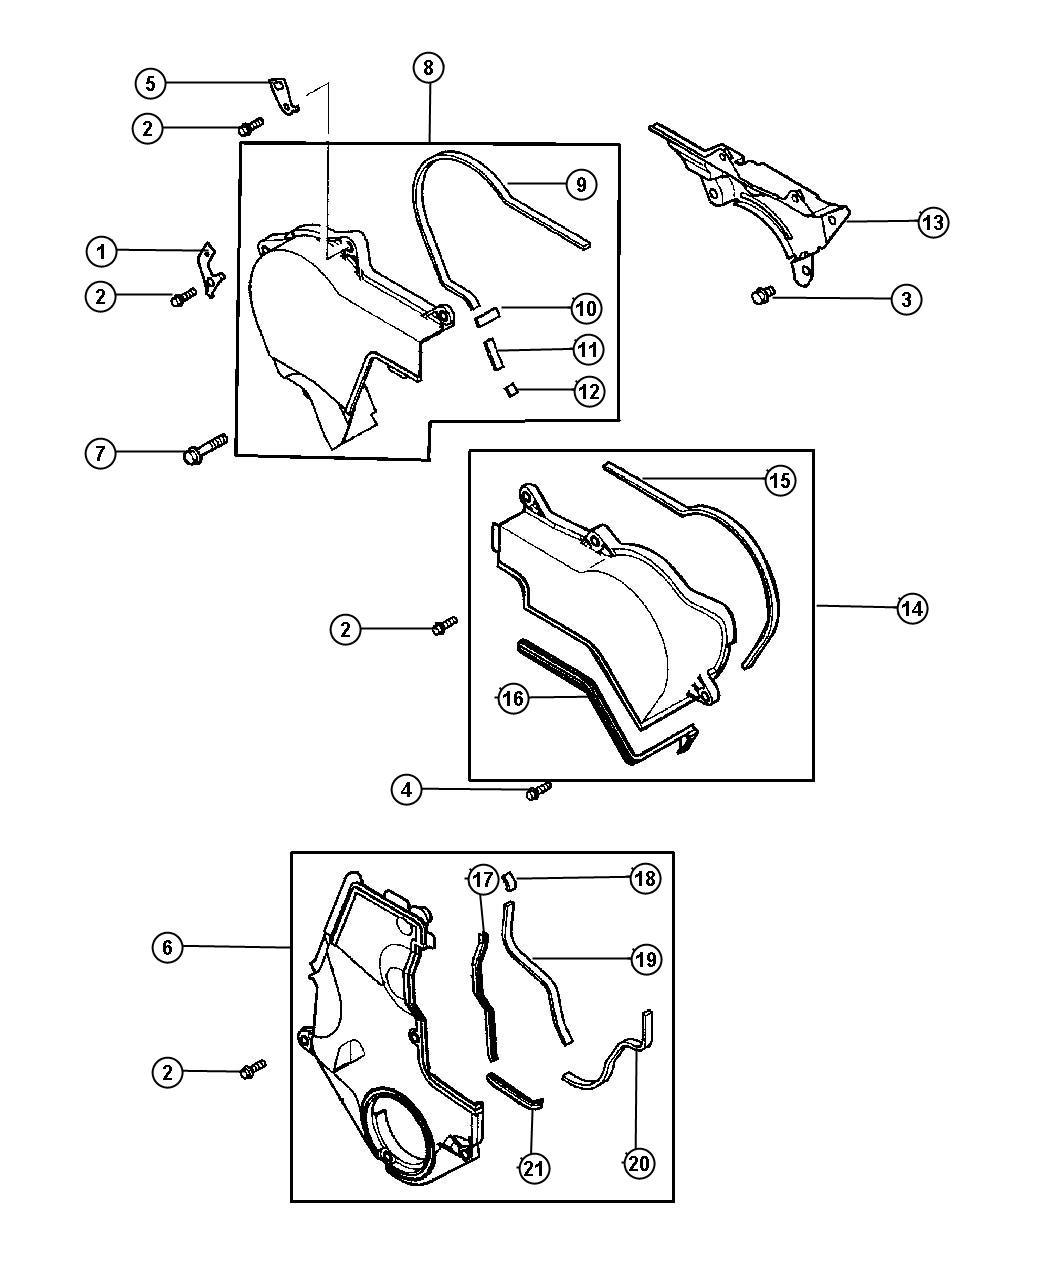 2005 dodge stratus sxt engine diagram